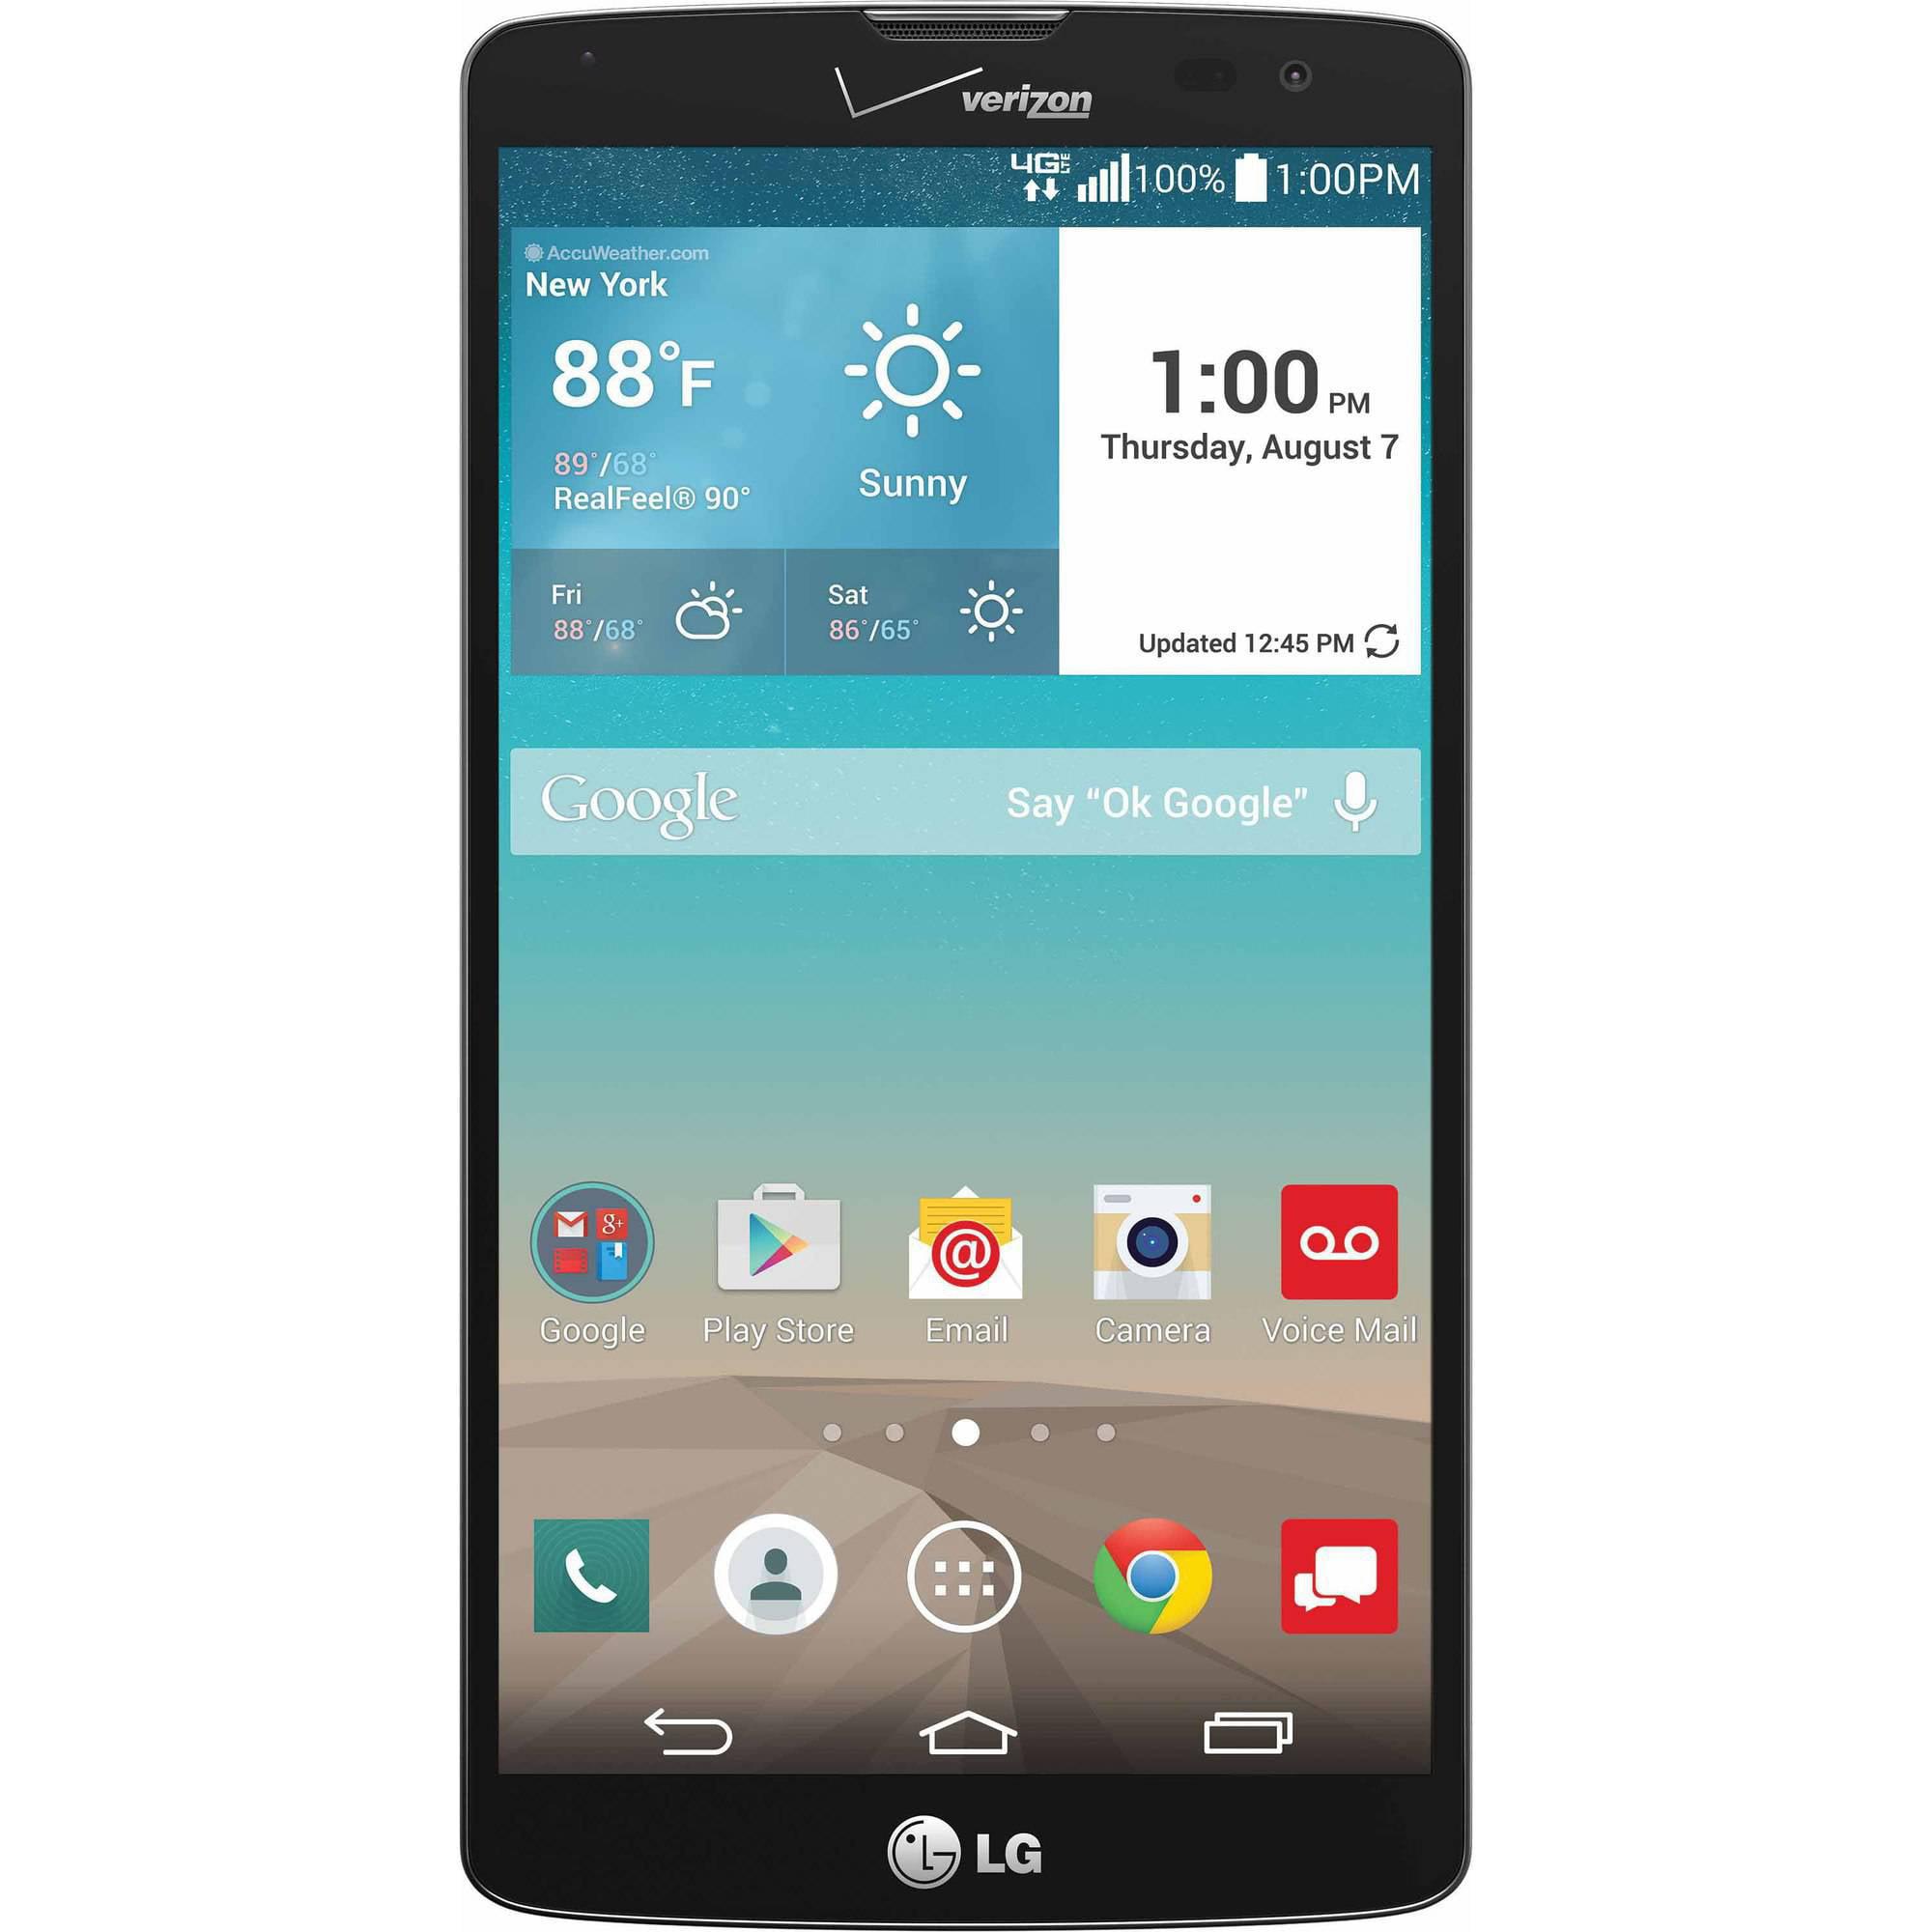 Verizon LG Vista Prepaid Smartphone